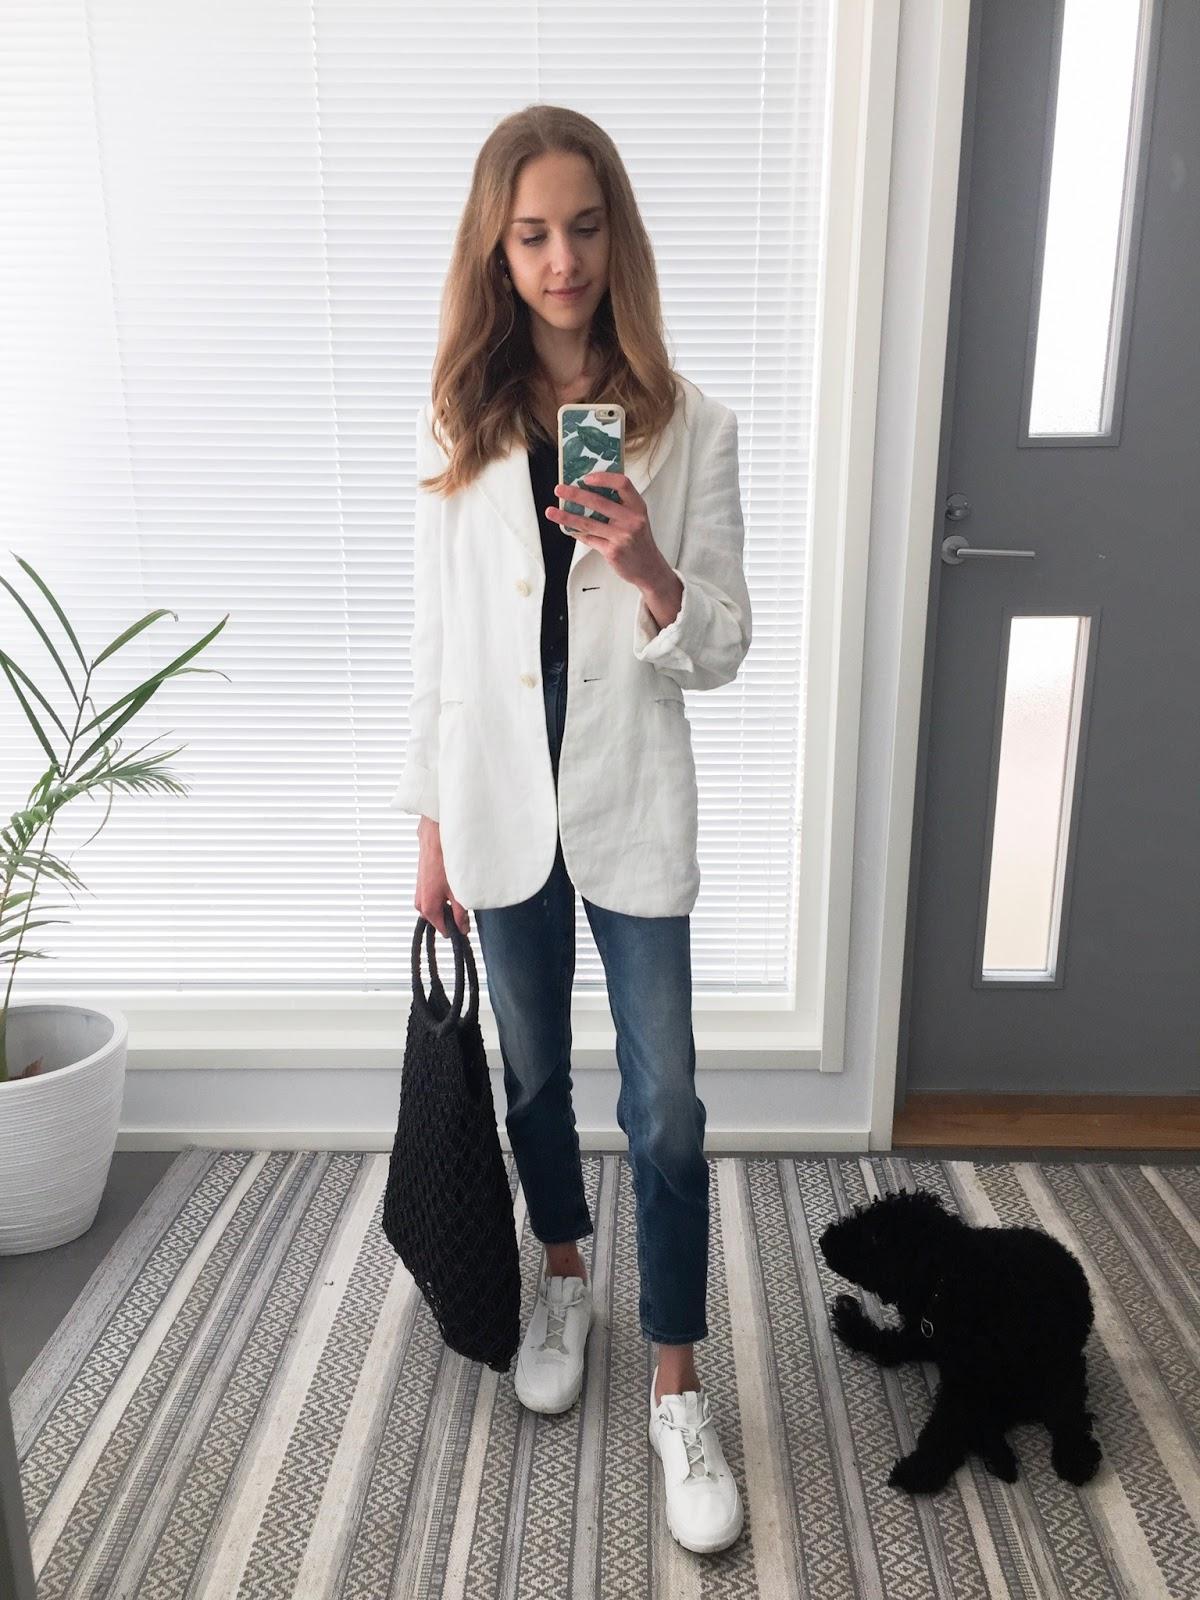 fashion-blogger-real-outfit-mom-jeans-linen-blazer-muotibloggaaja-arkiasu-farkut-pellavableiseri